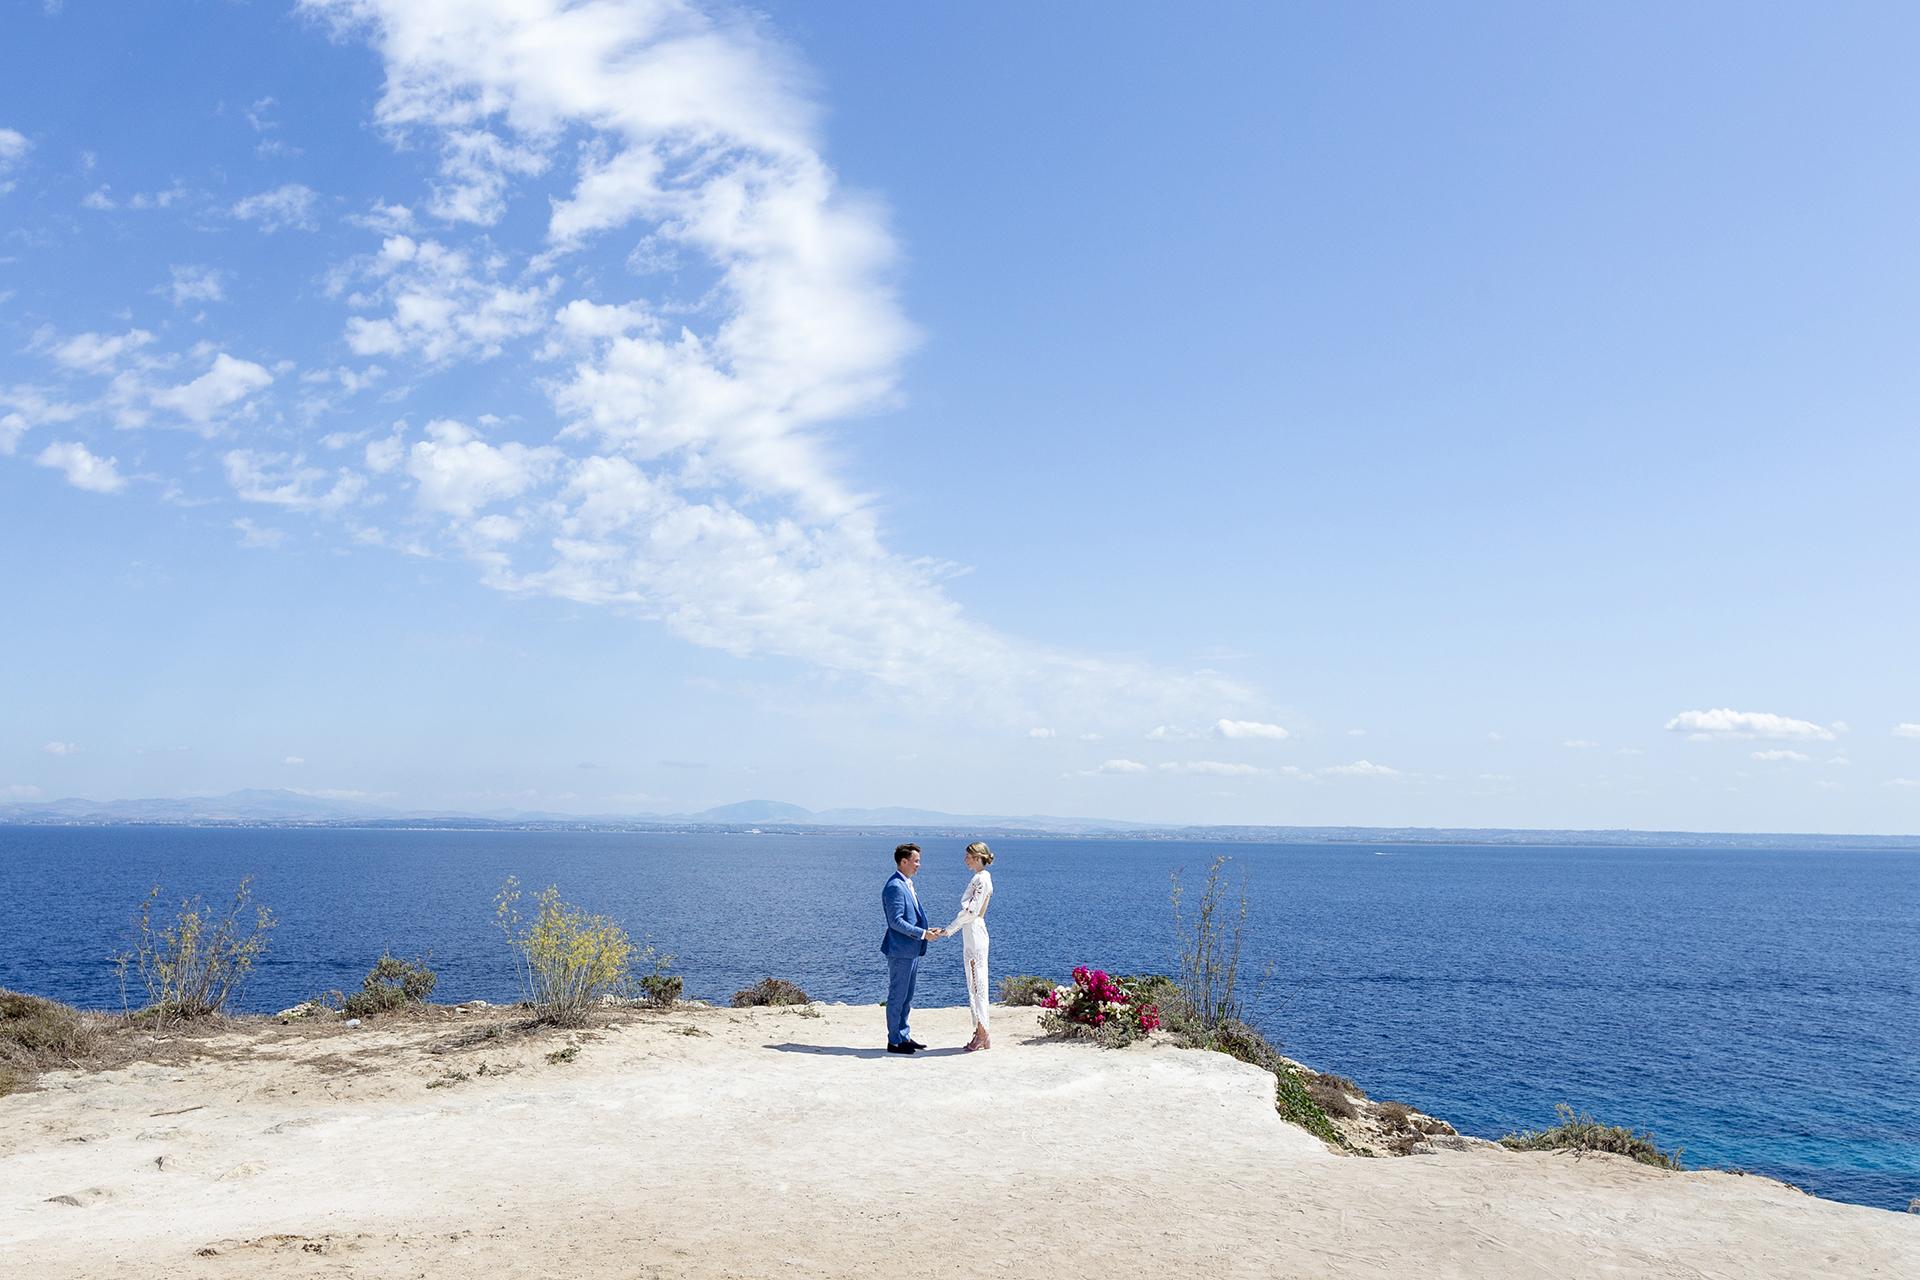 Schaking in Cala Bue Marino, Favignana Island, Sicilië